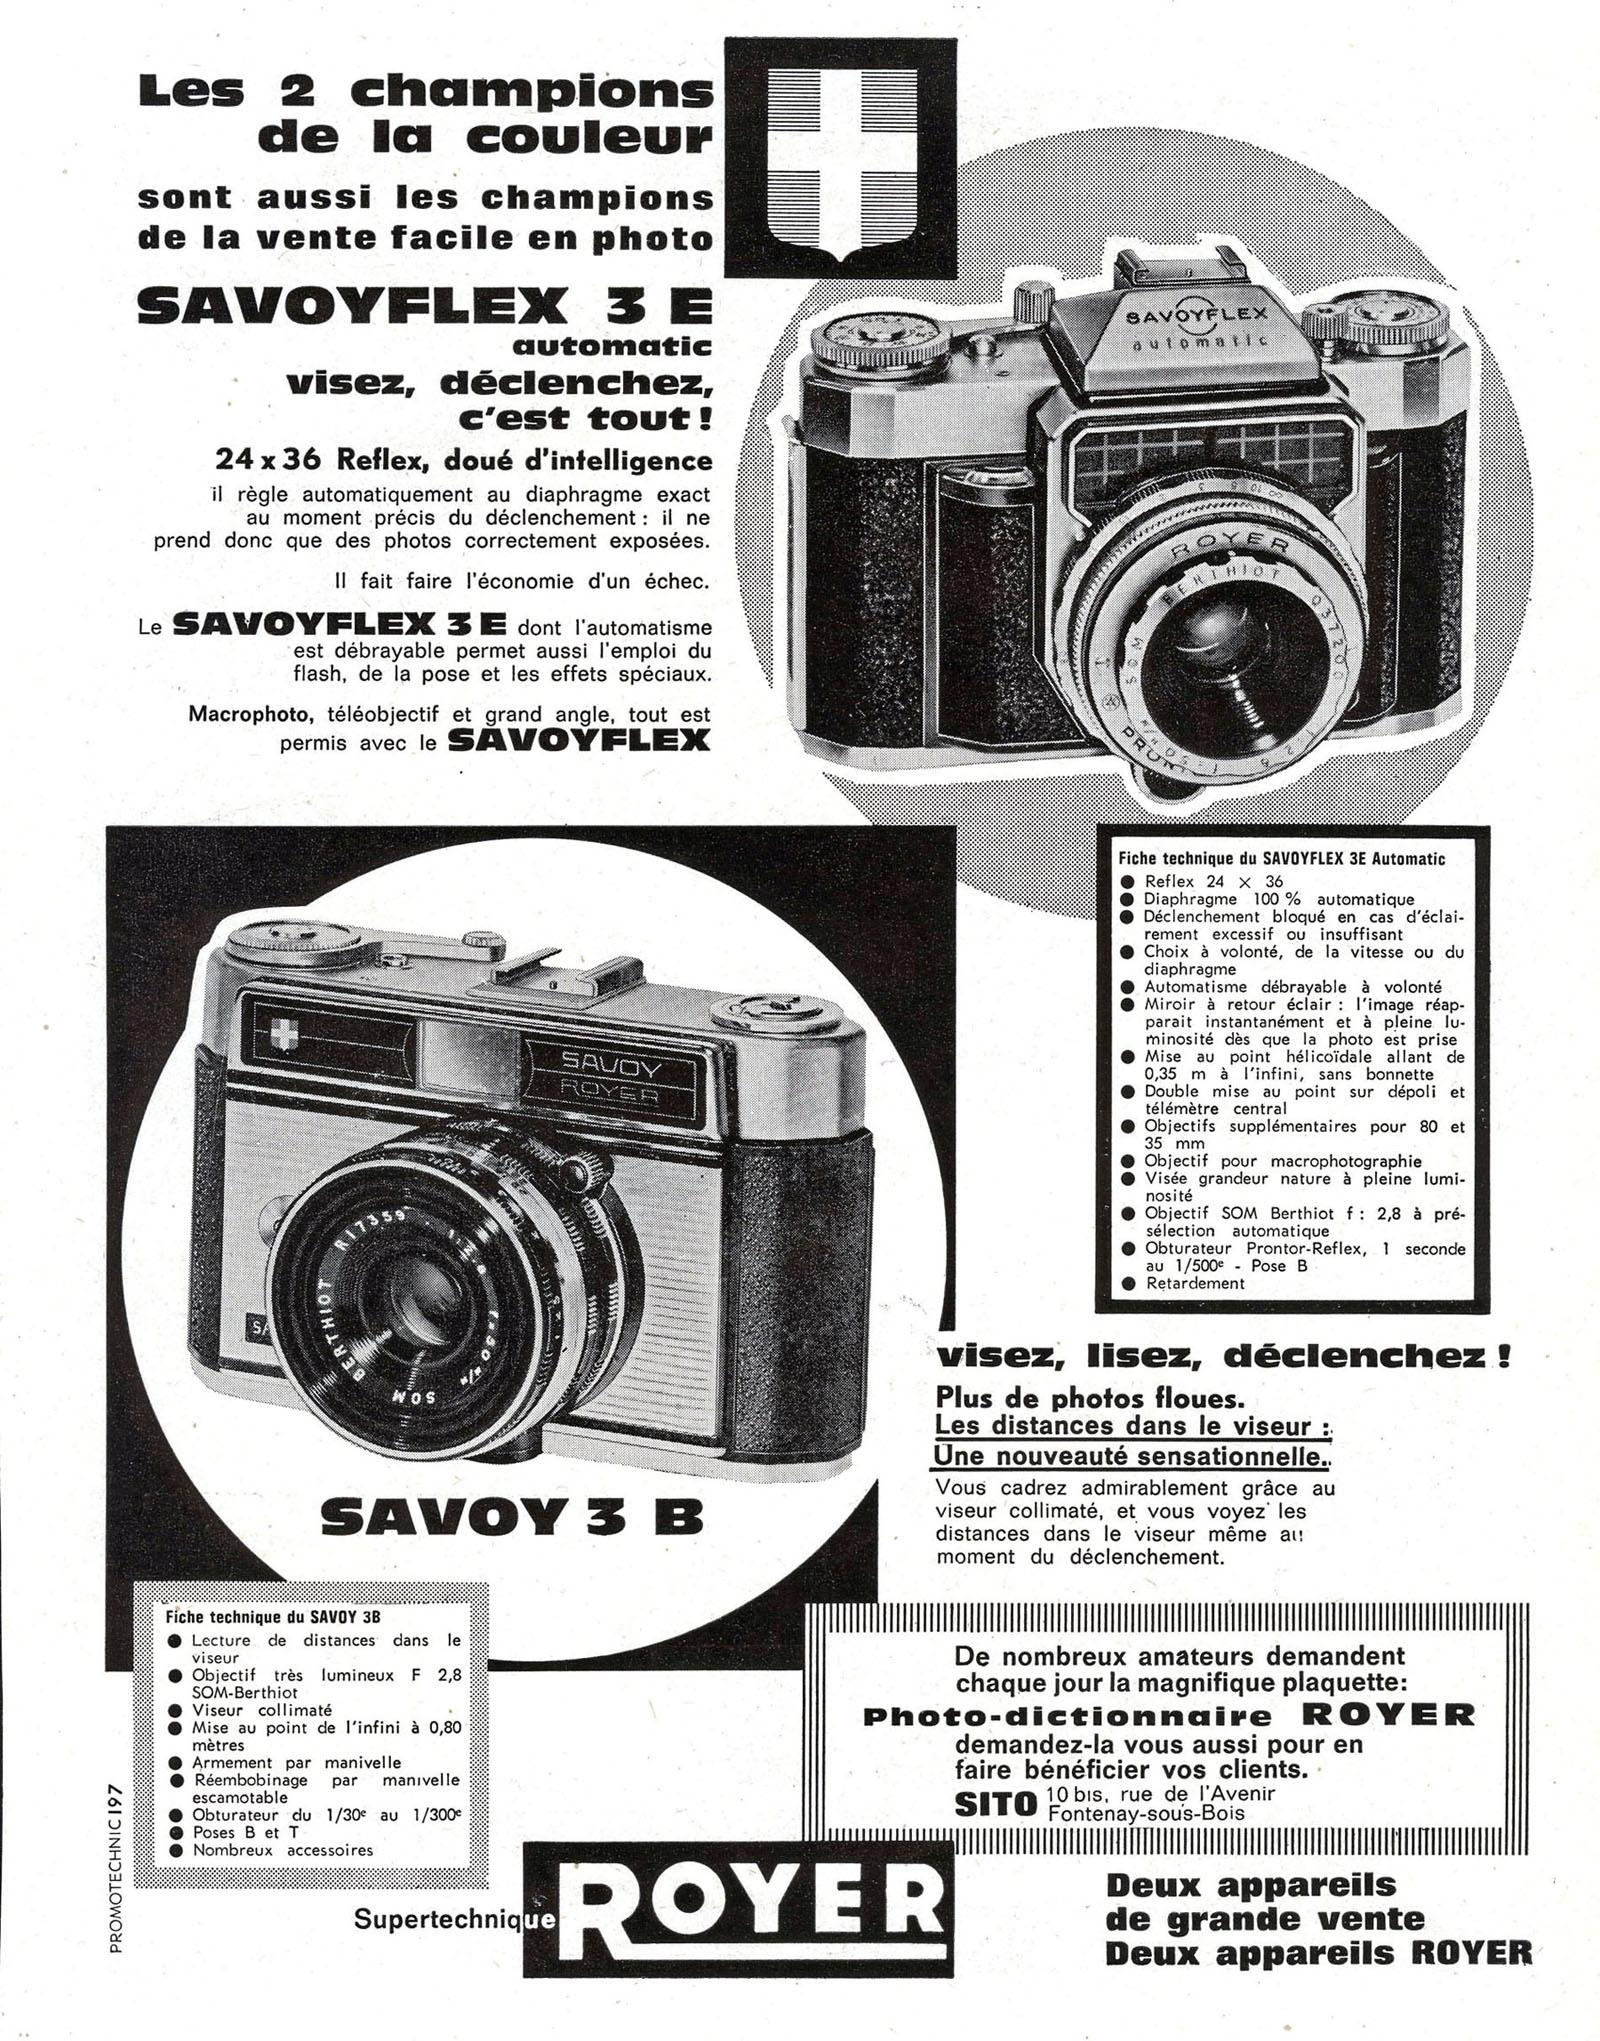 Wallpaper 1414-3  SITO ROYER  Savoyflex 3E automatic, collection AMI Appareils photos